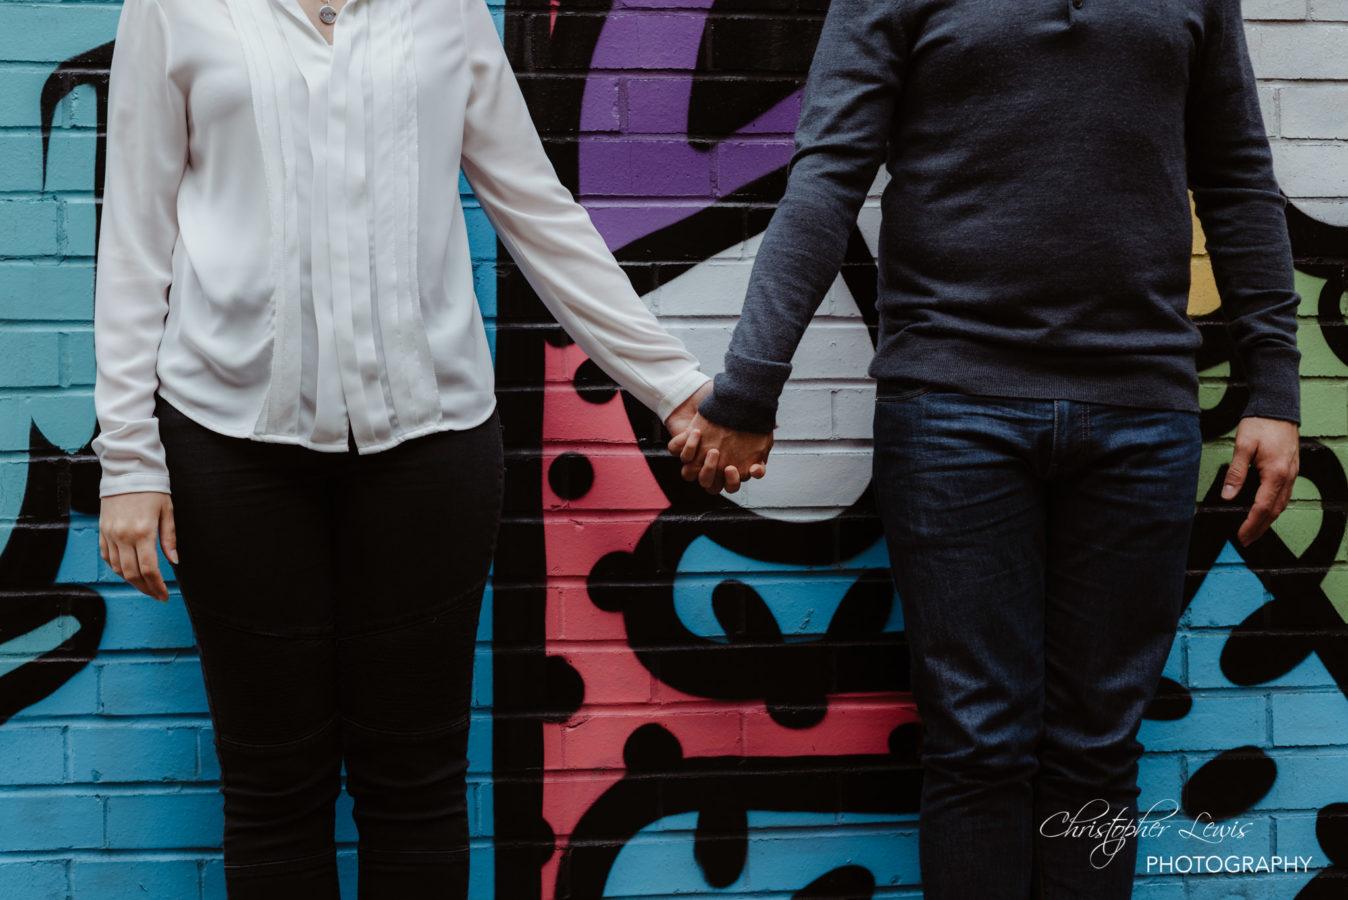 Northern-Quarter-Manchester-Pre-Wedding-Photoshoot-12